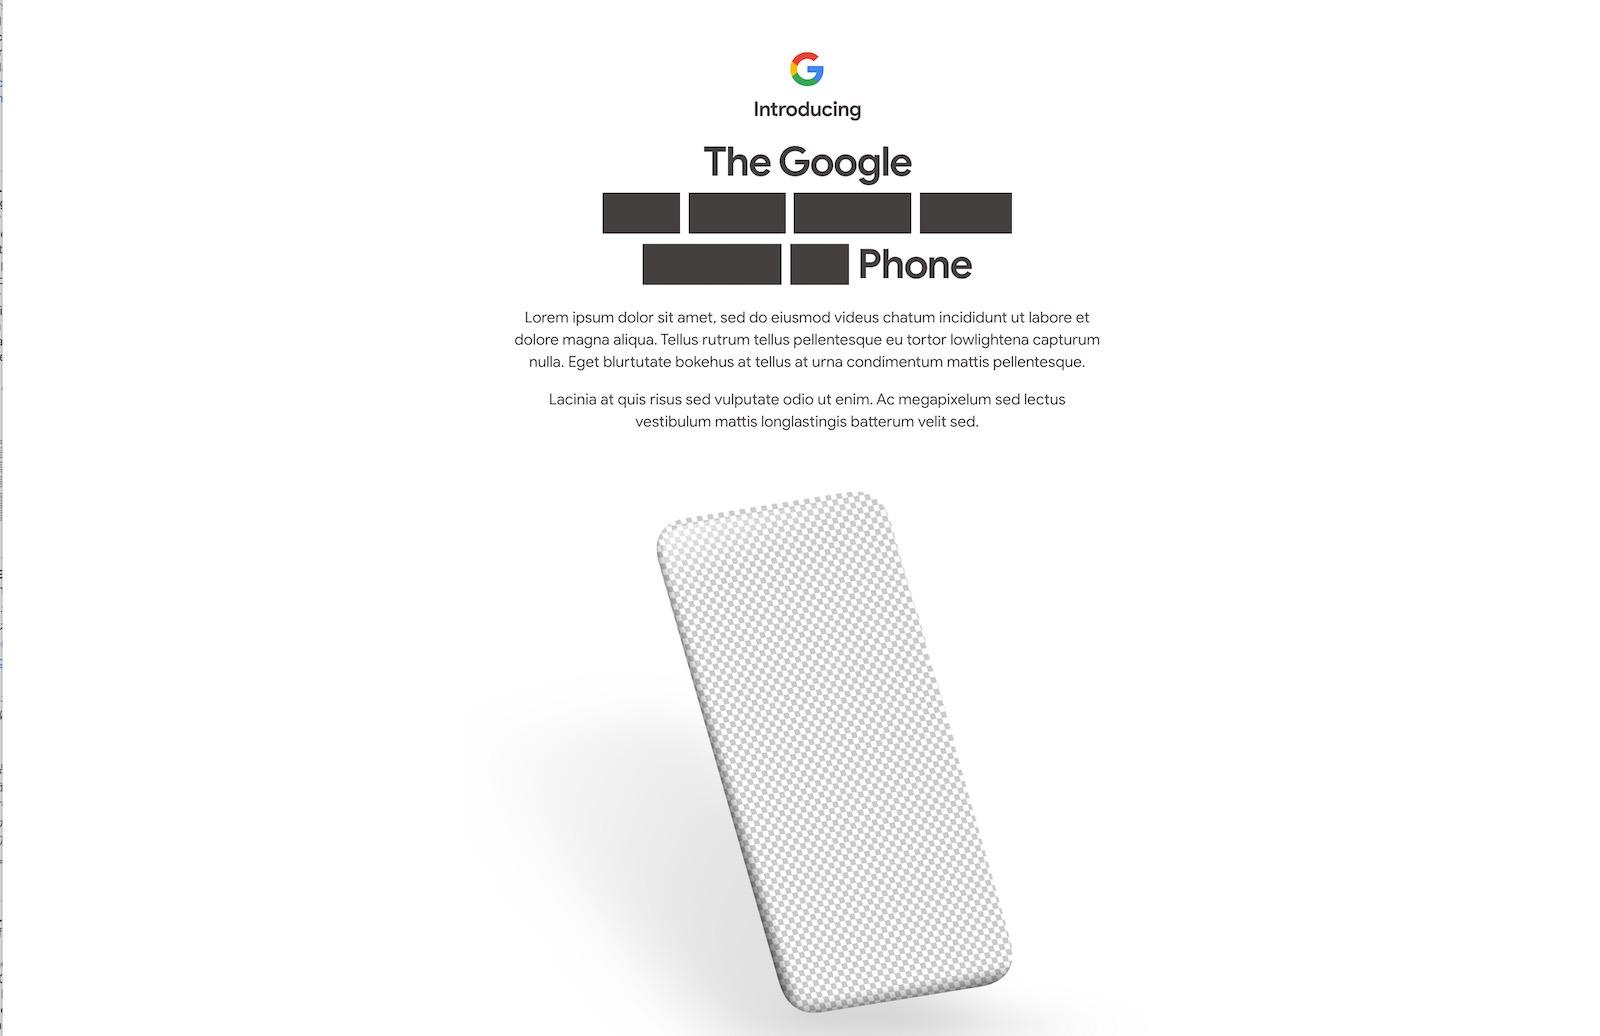 Instroducing-the-google-new-phone.jpg